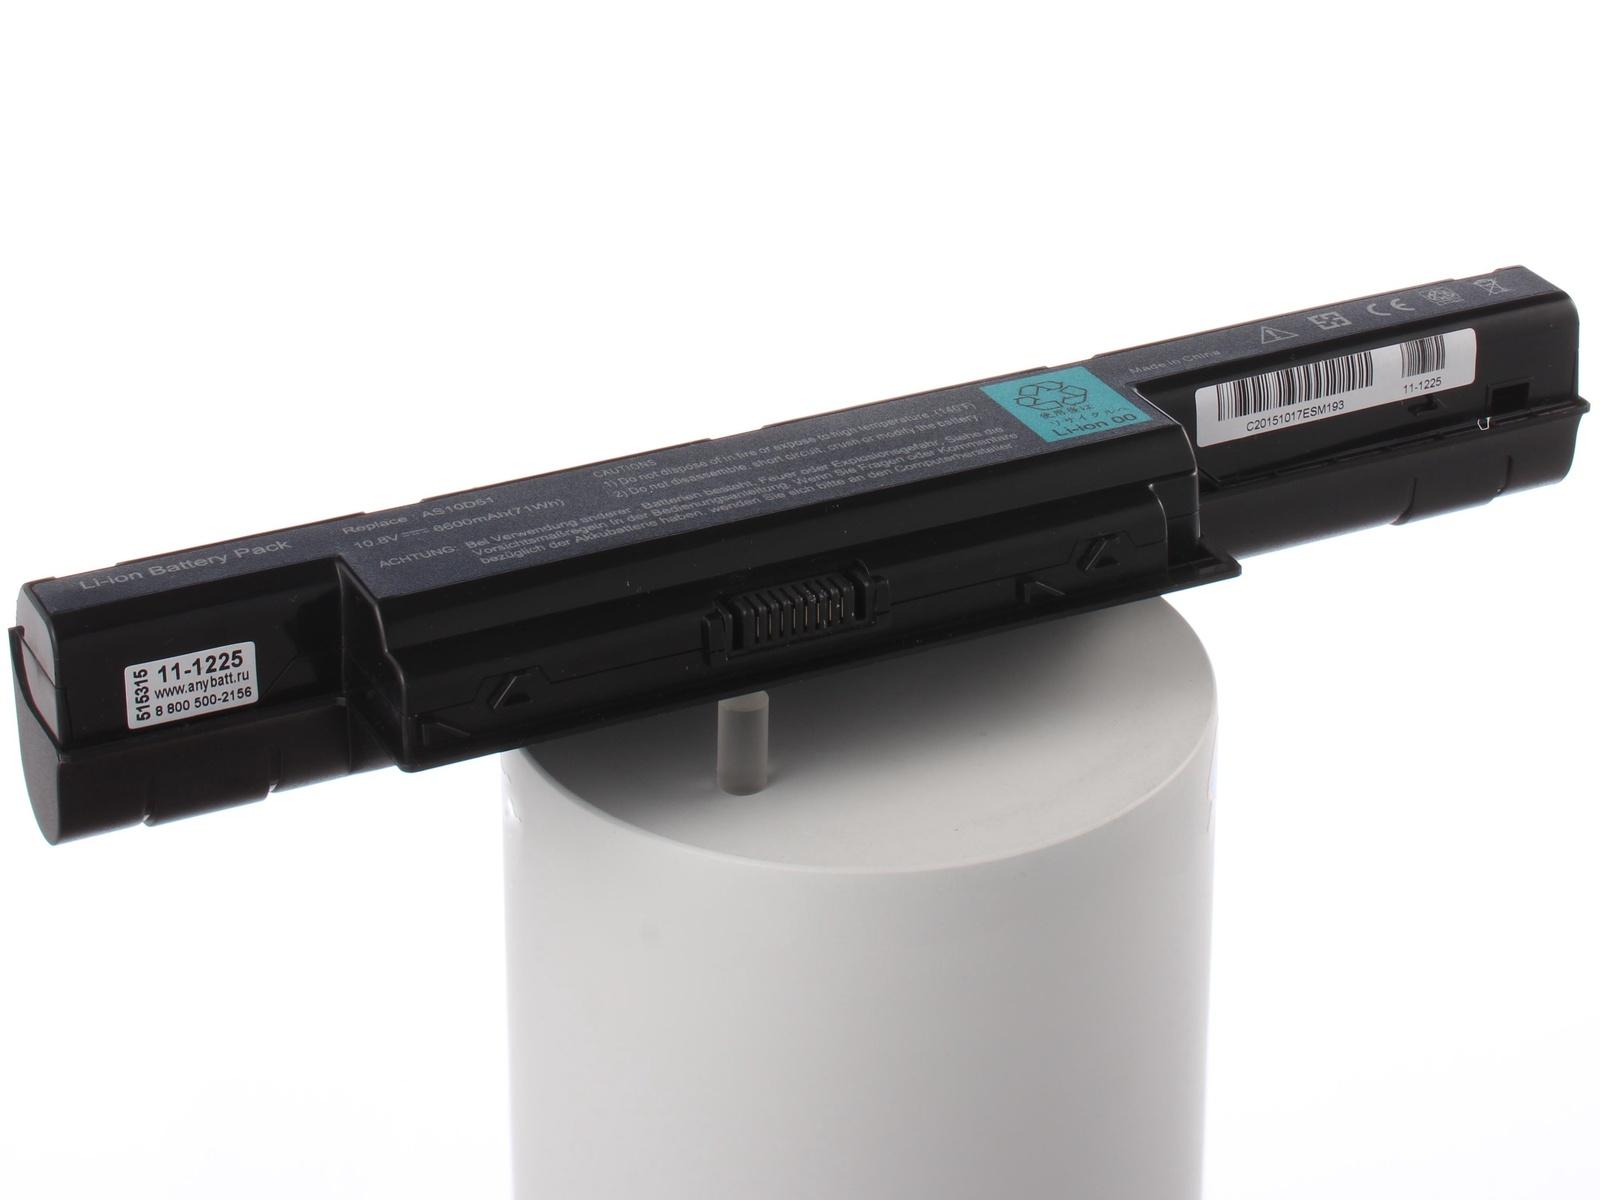 Аккумулятор для ноутбука AnyBatt для Acer Aspire 5750G-2434G32Mnkk, Aspire E1-772G-54204G50Mnsk, Aspire V3-551-10468G1TMakk, eMachines E732ZG-P612G32Mikk, Aspire 5336-902G25MIkk, Aspire 5560-433054G50Mnkk аккумулятор для ноутбука anybatt для acer aspire 5334 902g25mikk aspire 7715z emachines e527 902g16mi aspire 5732zg 453g25mi aspire 5334 332g25mikk aspire 5517 5661 aspire 5517 5997 aspire 5732z 442g16mi